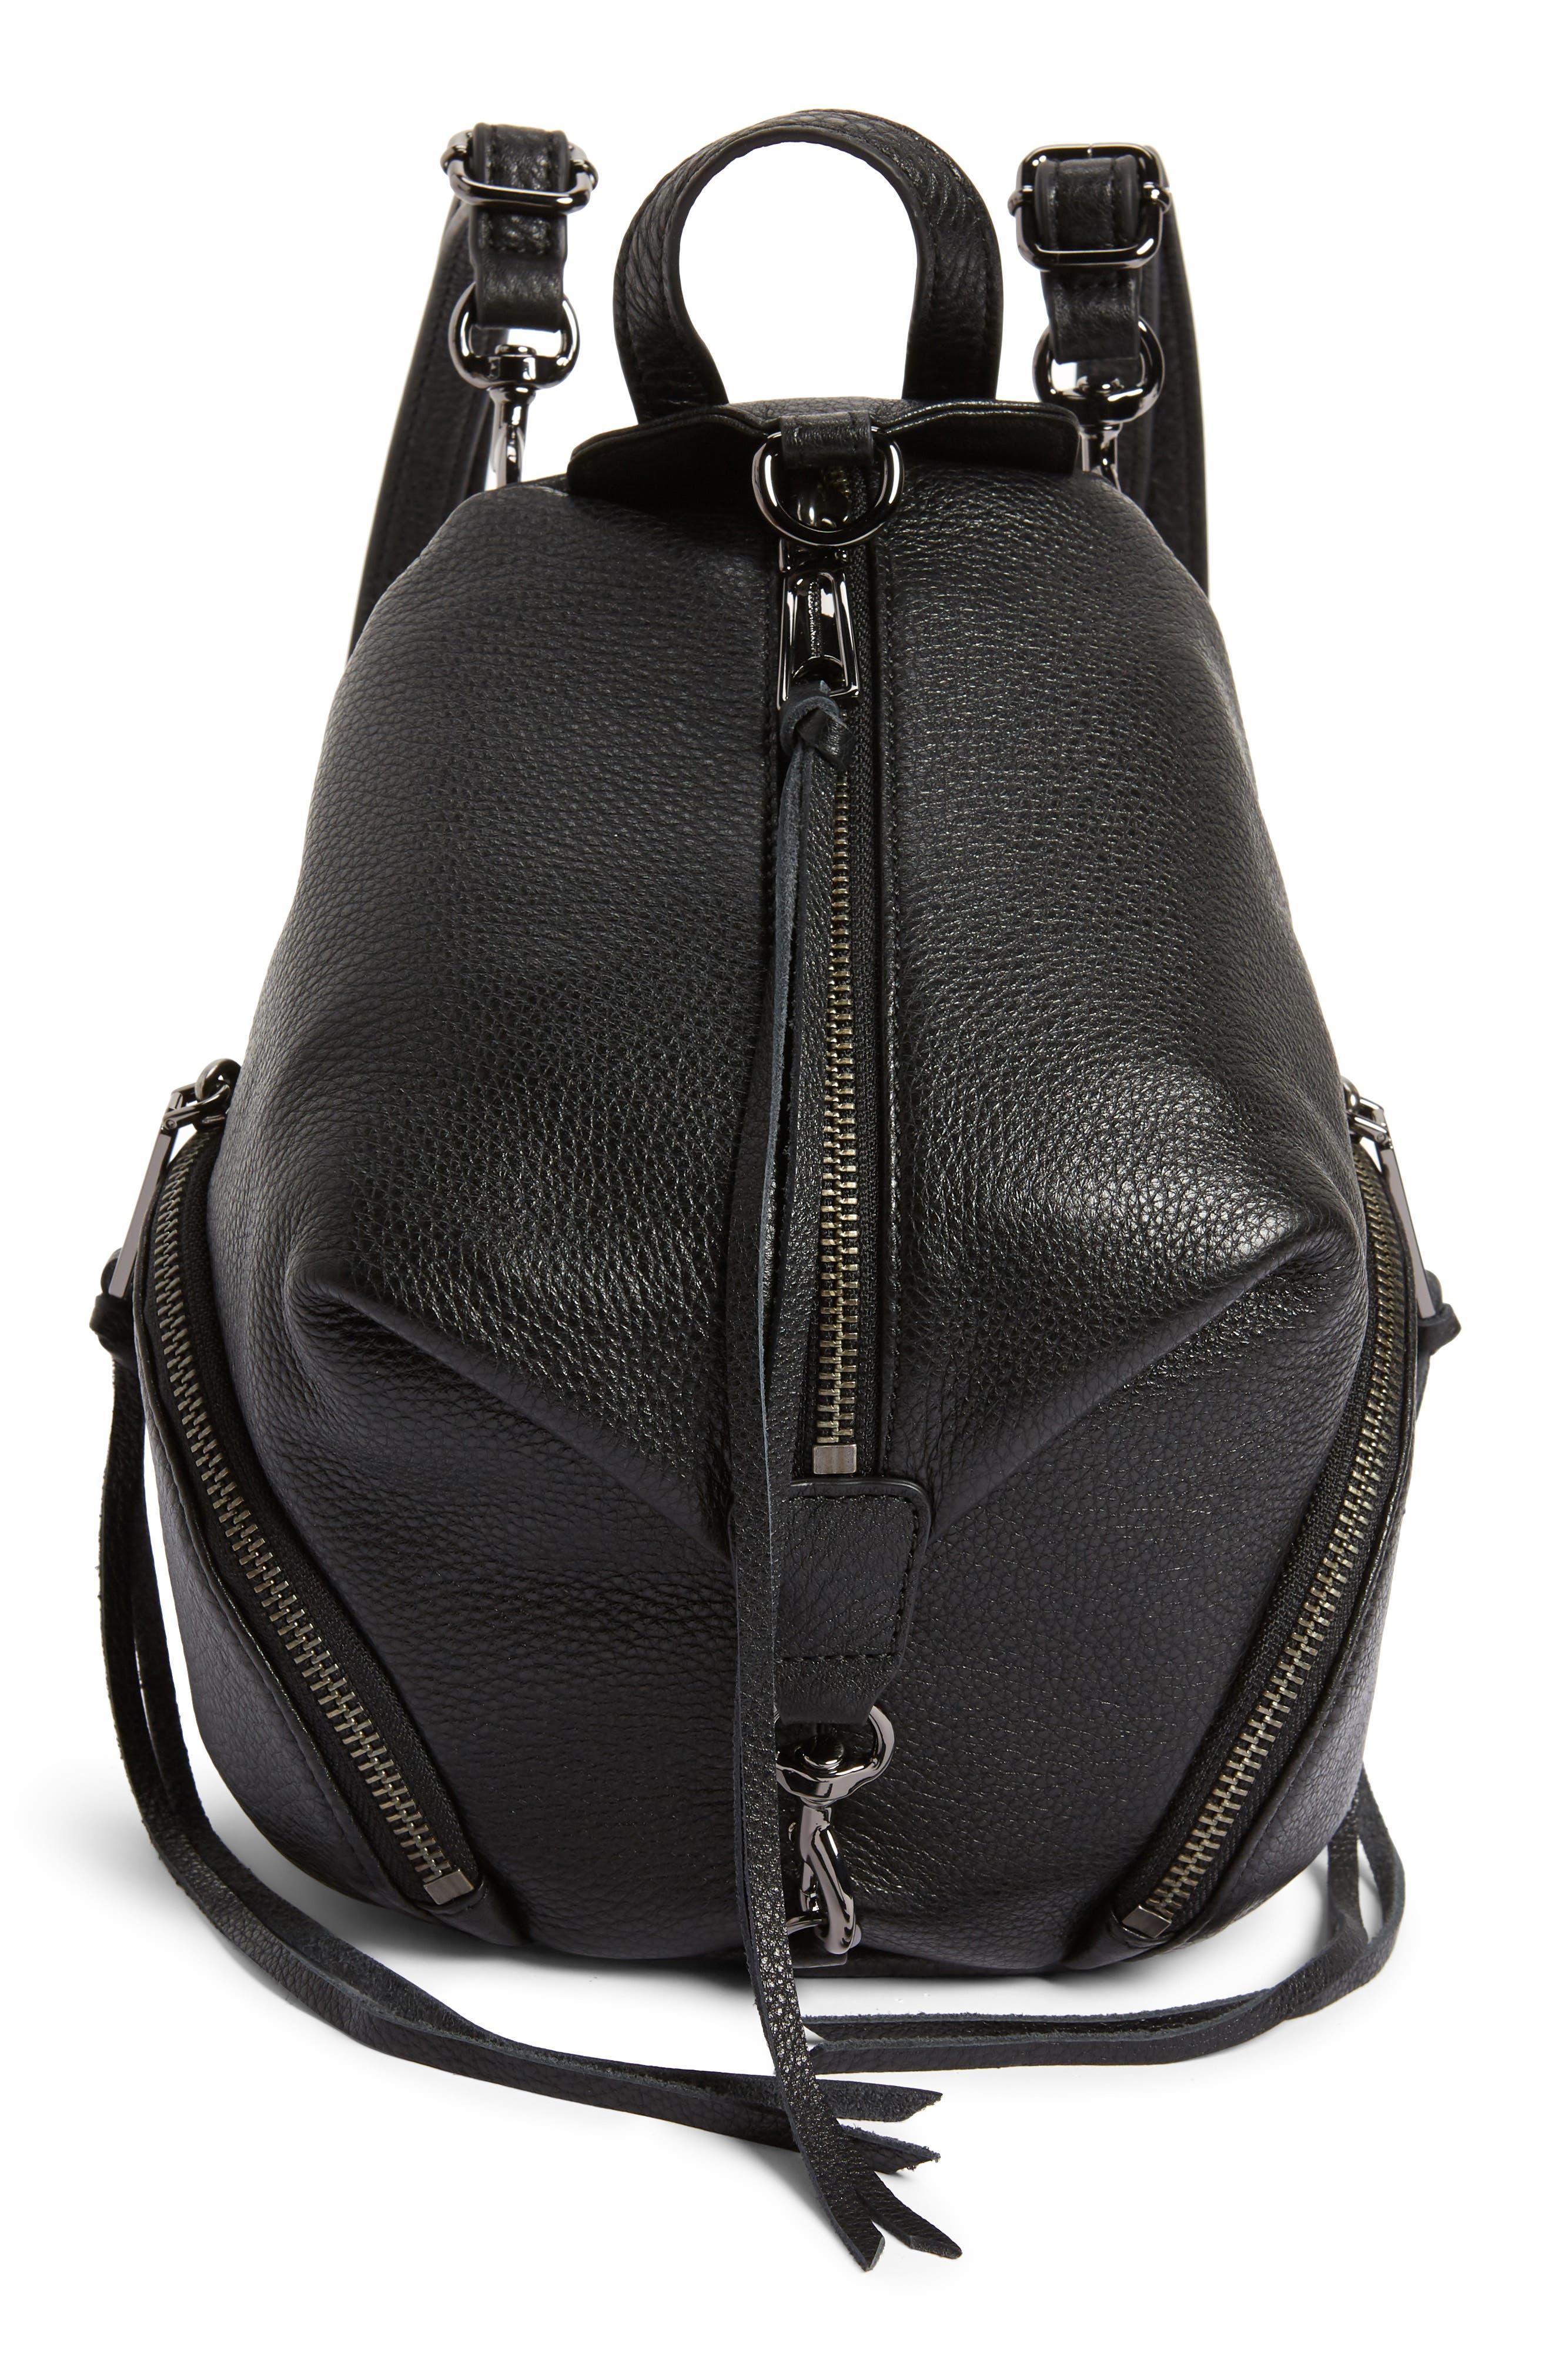 REBECCA MINKOFF, Mini Julian Pebbled Leather Convertible Backpack, Main thumbnail 1, color, BLACK